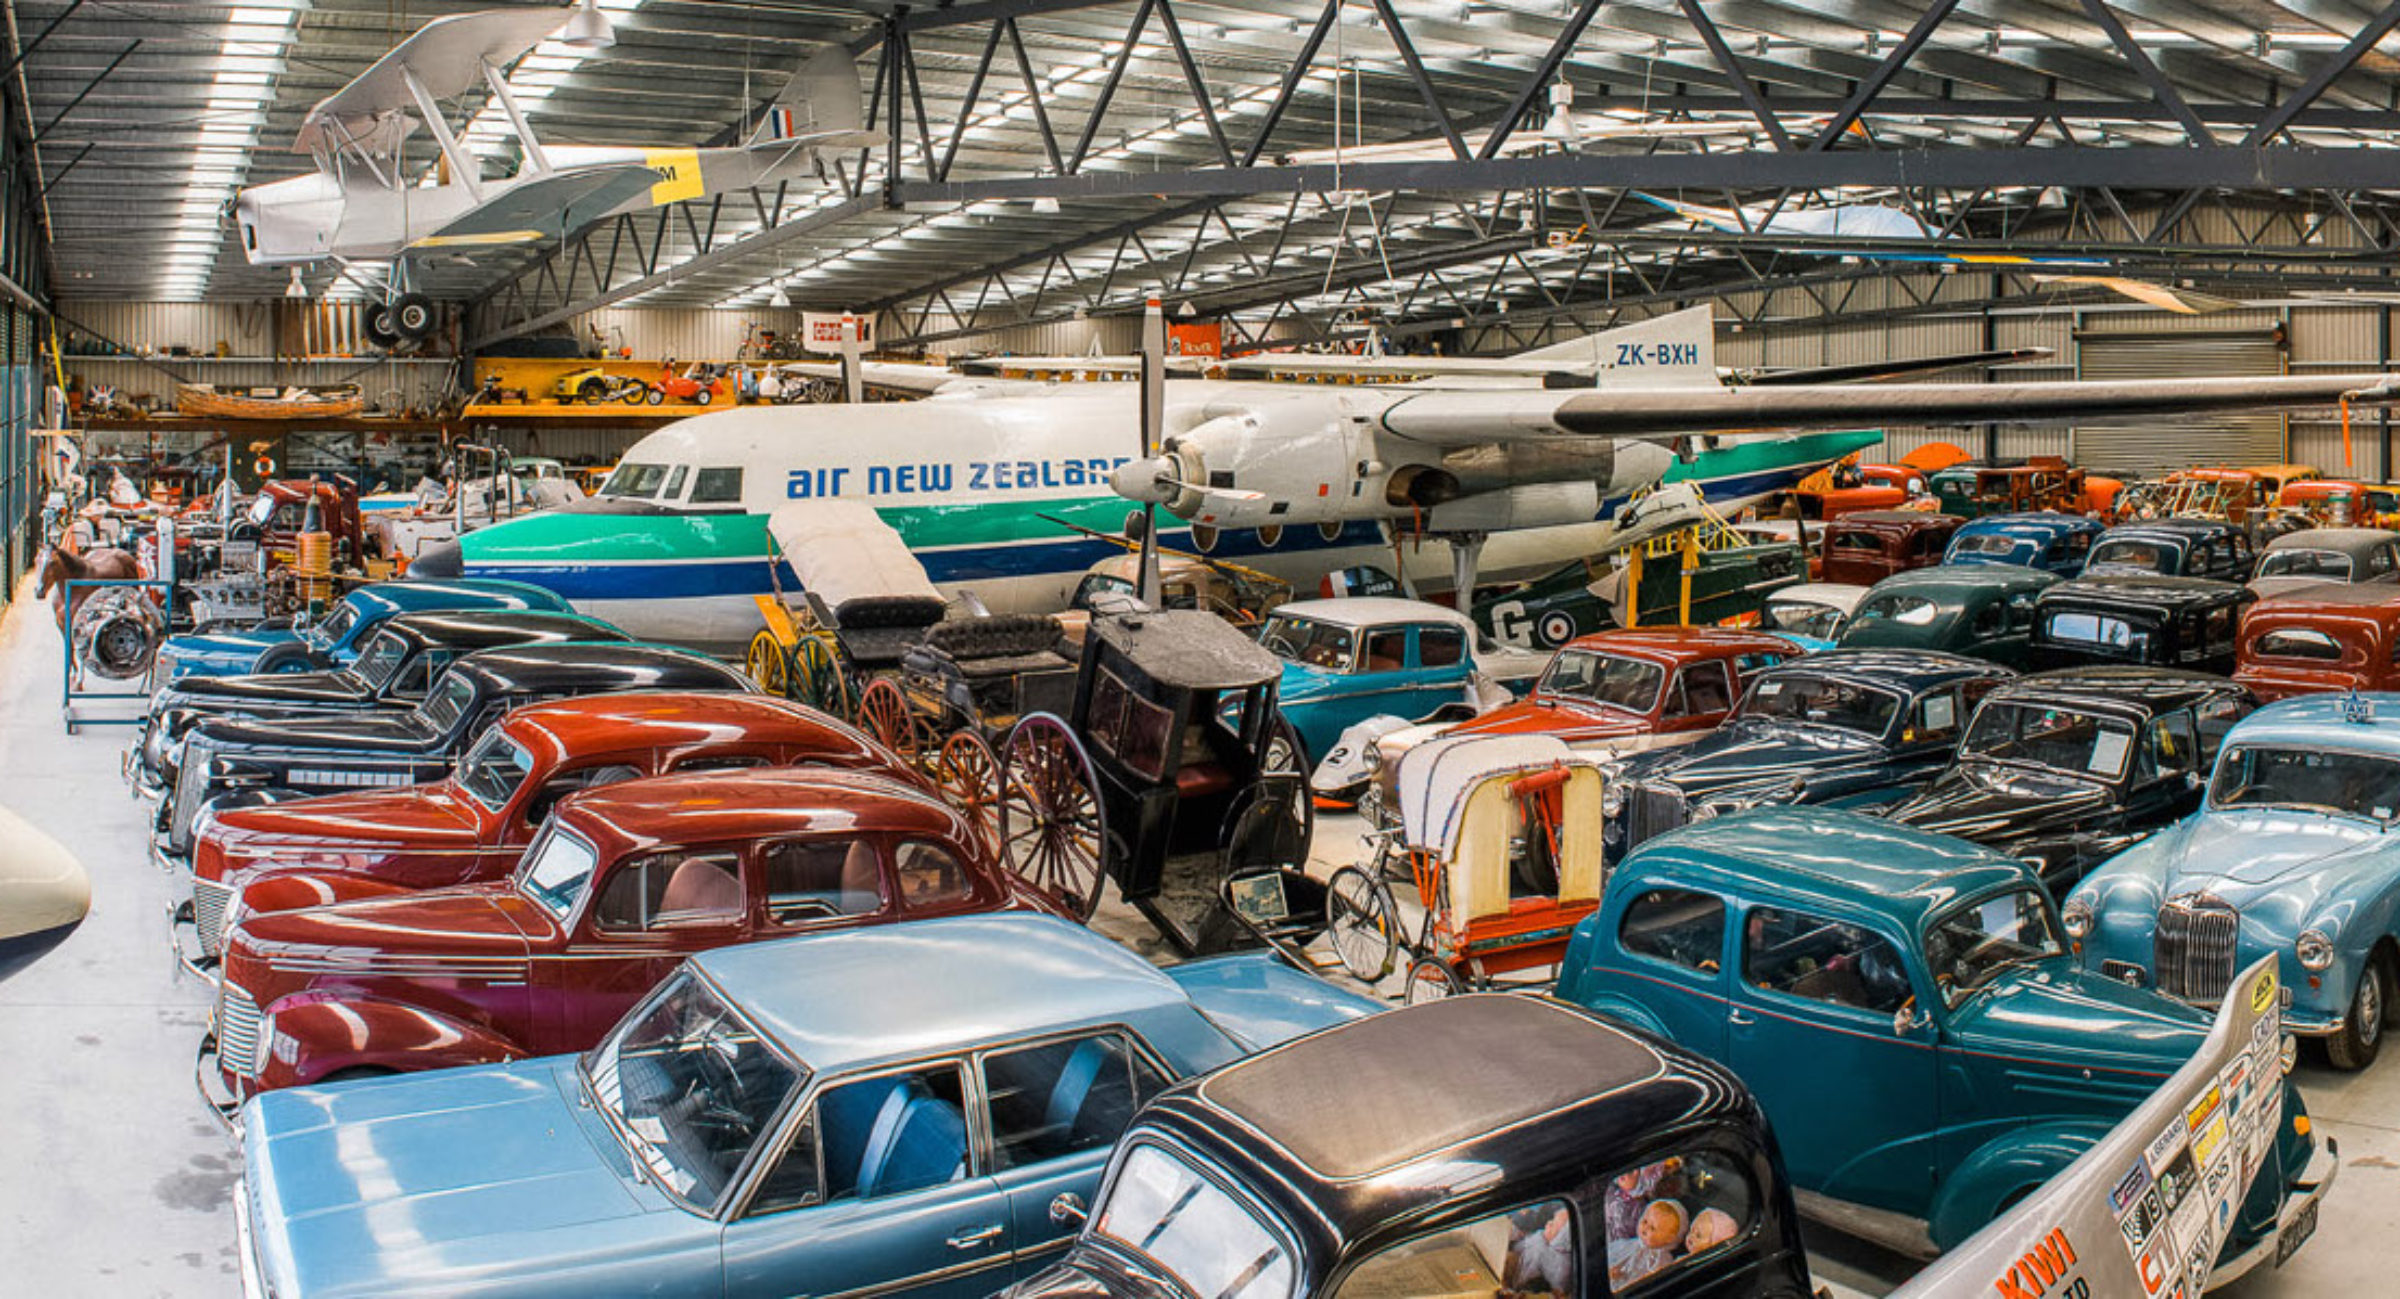 National Transport & Toy Museum Wanaka, NZ